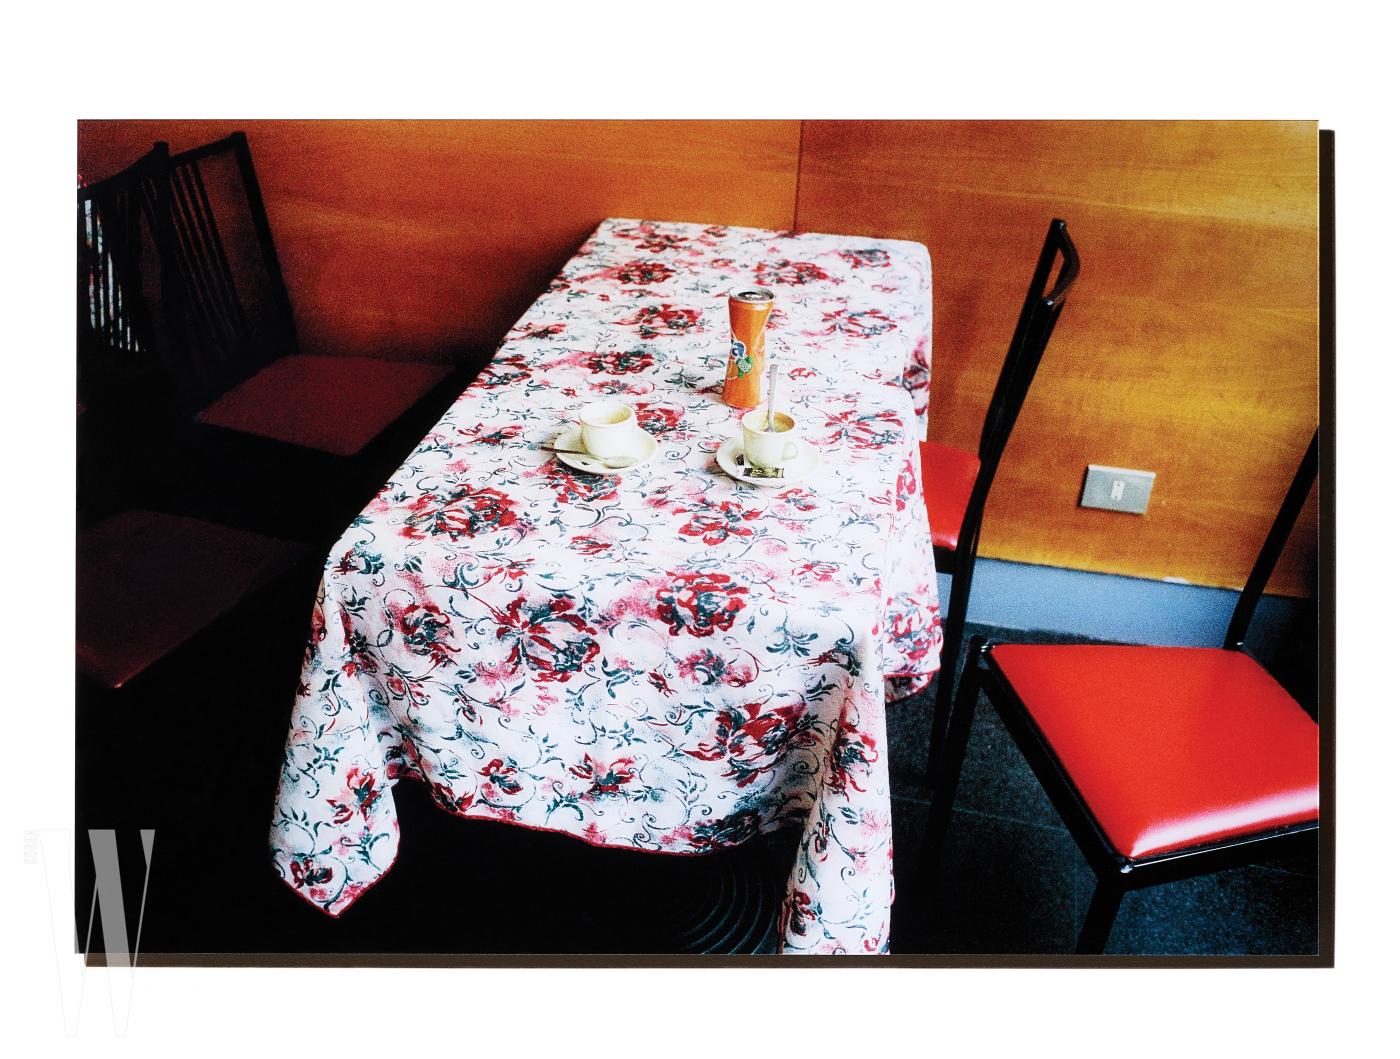 Coffee table 2015 Milan, Nam Hyunbeom by 갤러리프리다